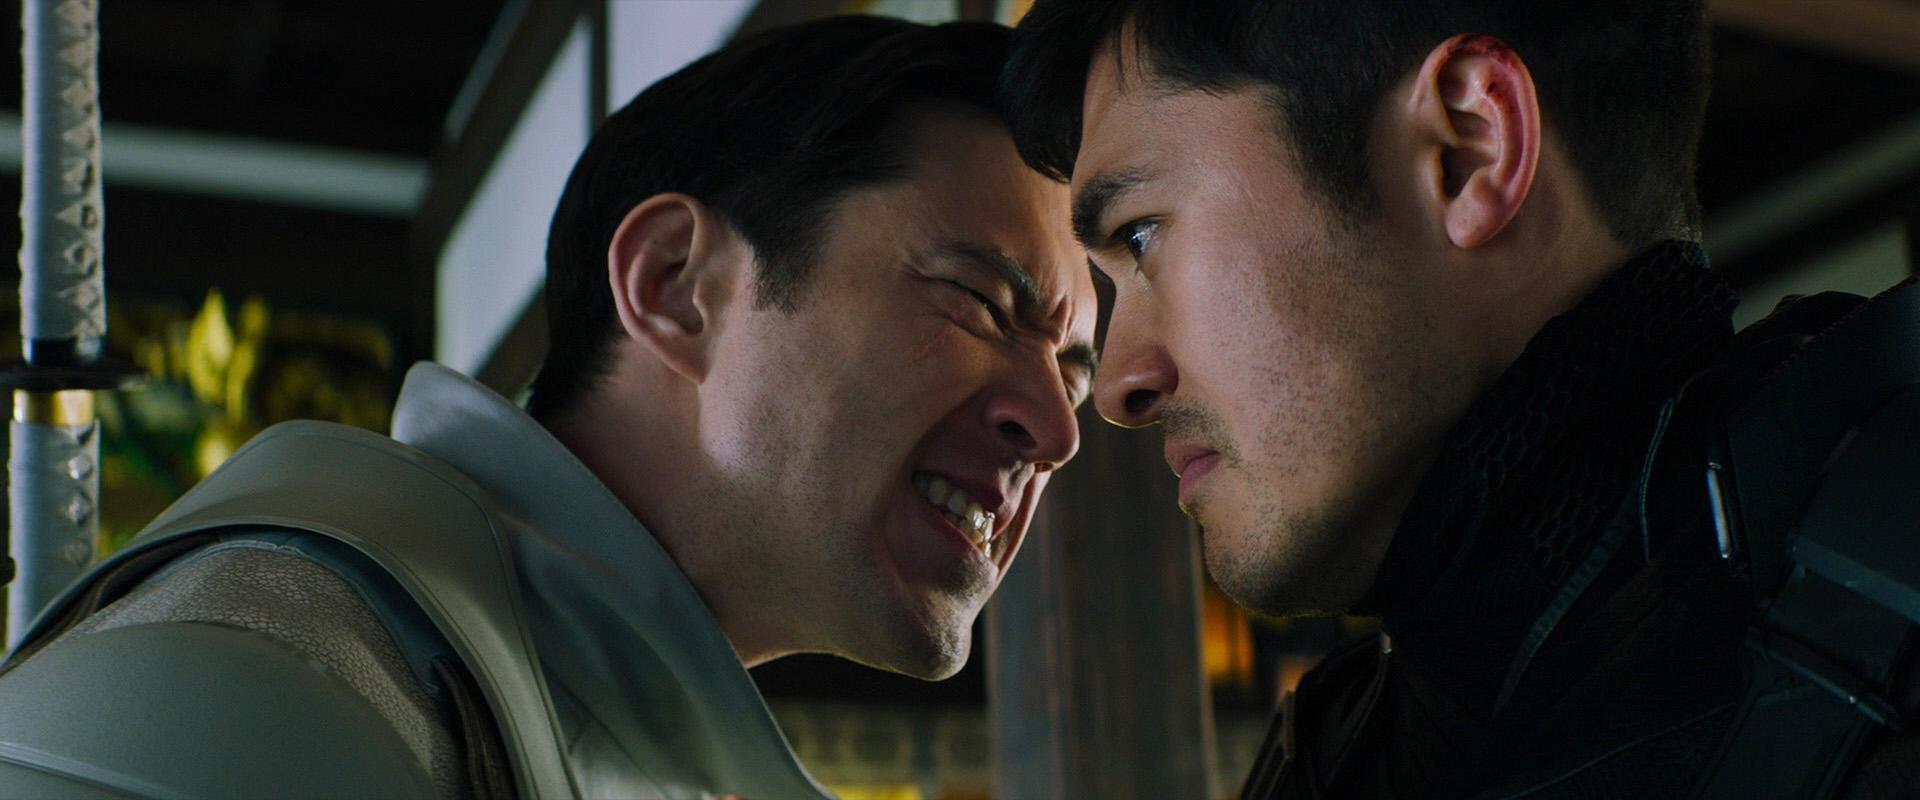 Snake Eyes: G.I. Joe Origins | 2021 | BDRip | XviD | Türkçe Dublaj | 720p - 1080p - m720p - m1080p | BluRay | Dual | TR-EN | Tek Link